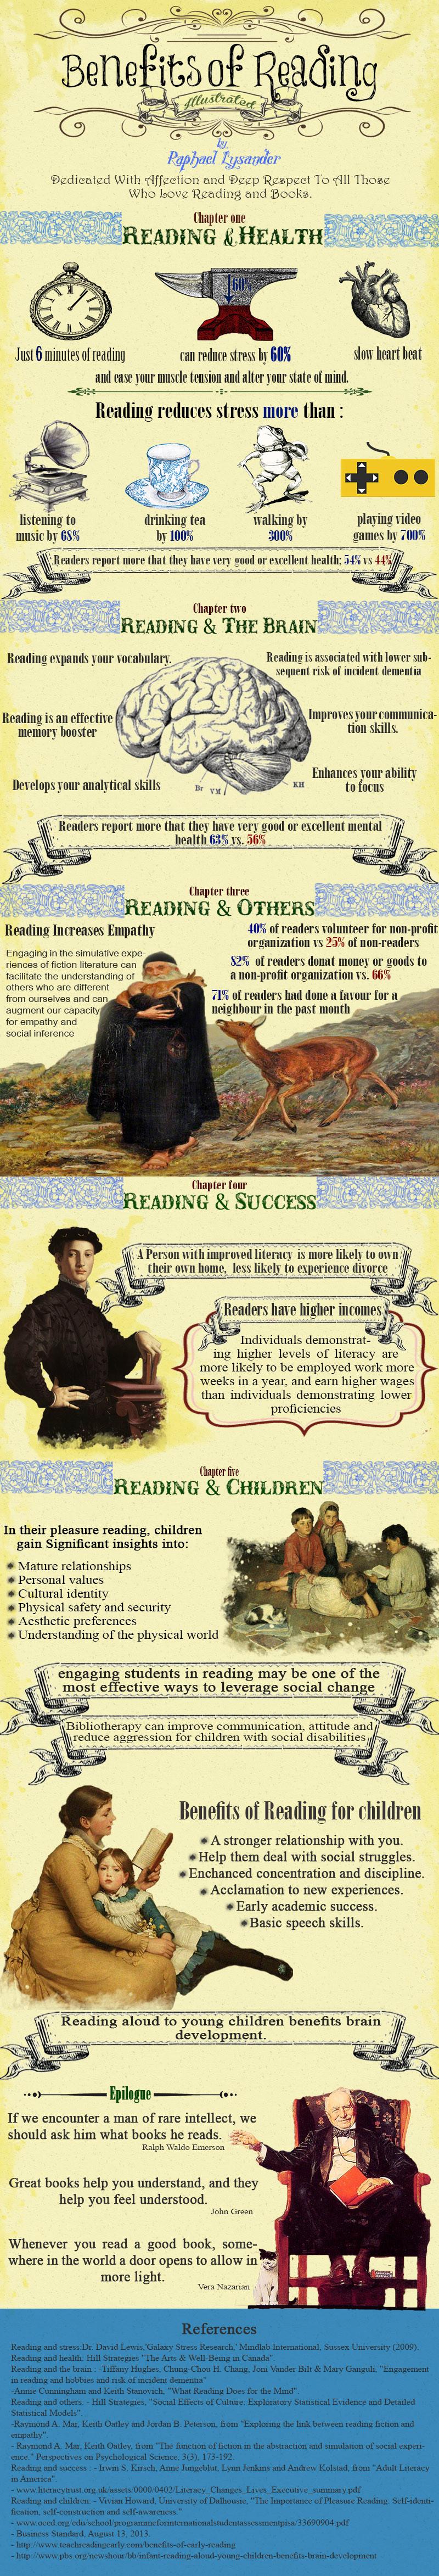 benifets-of-reading2